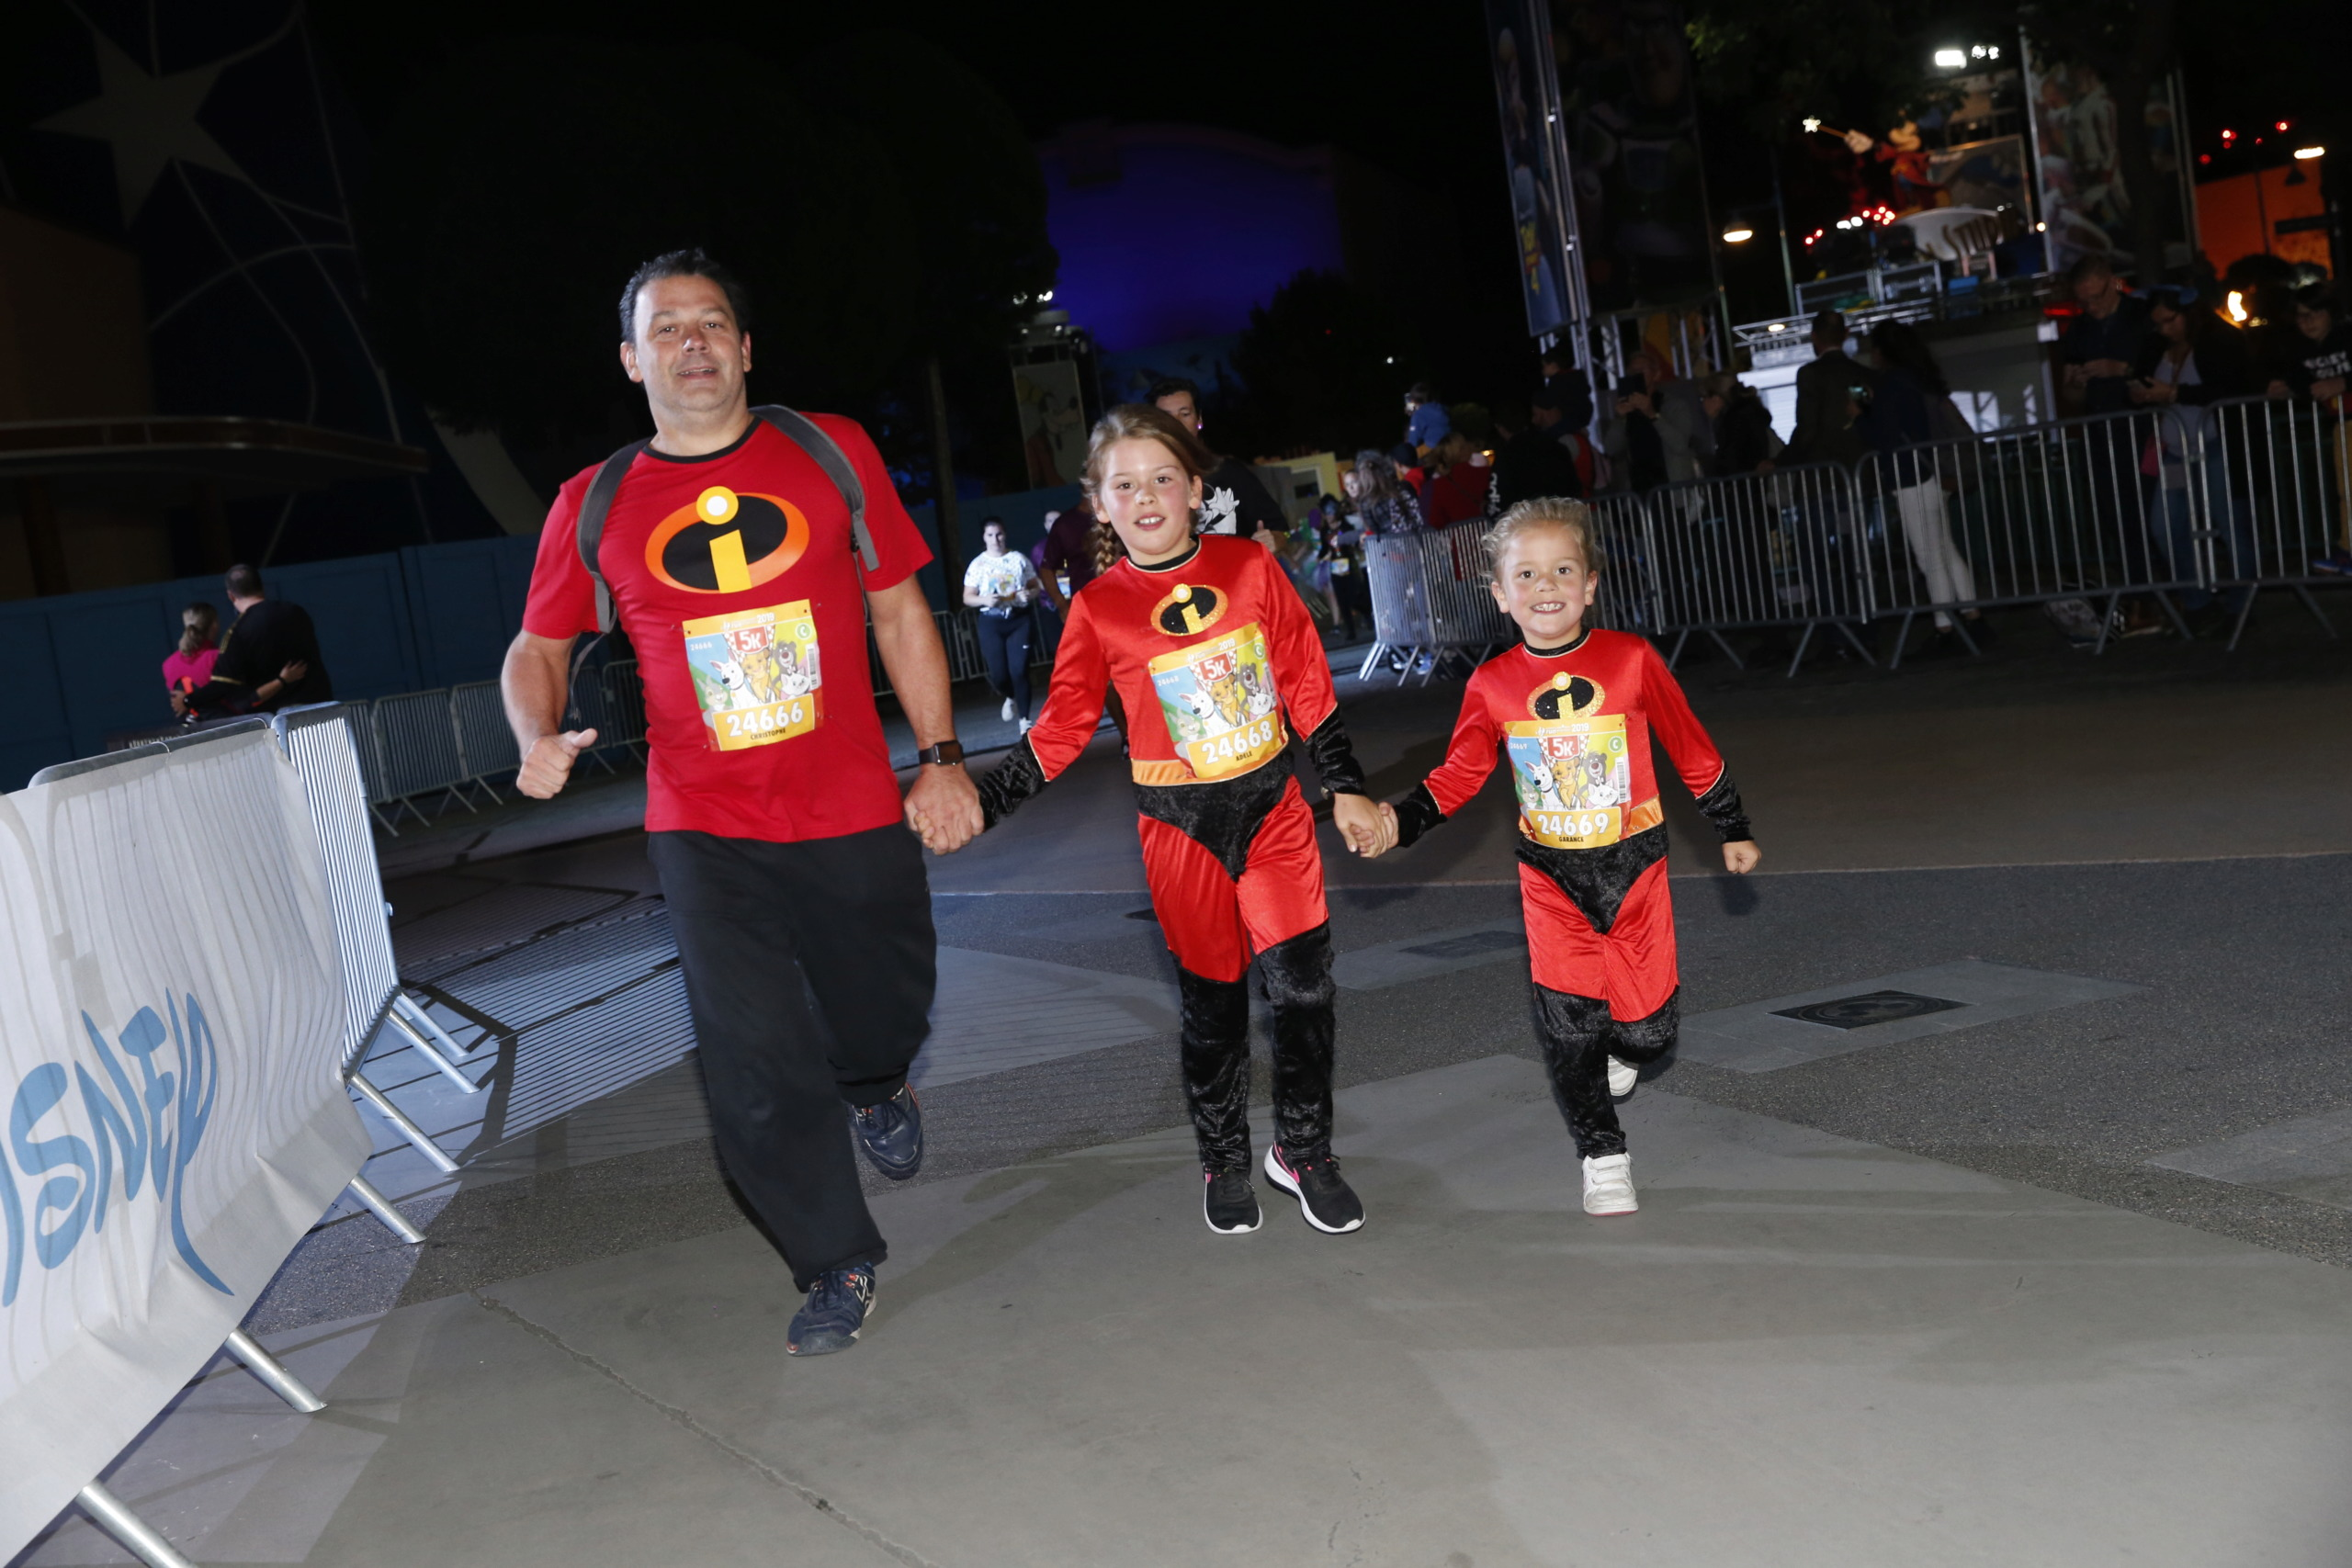 2019 - Disneyland Paris Run Weekend - Pagina 2 5k_310